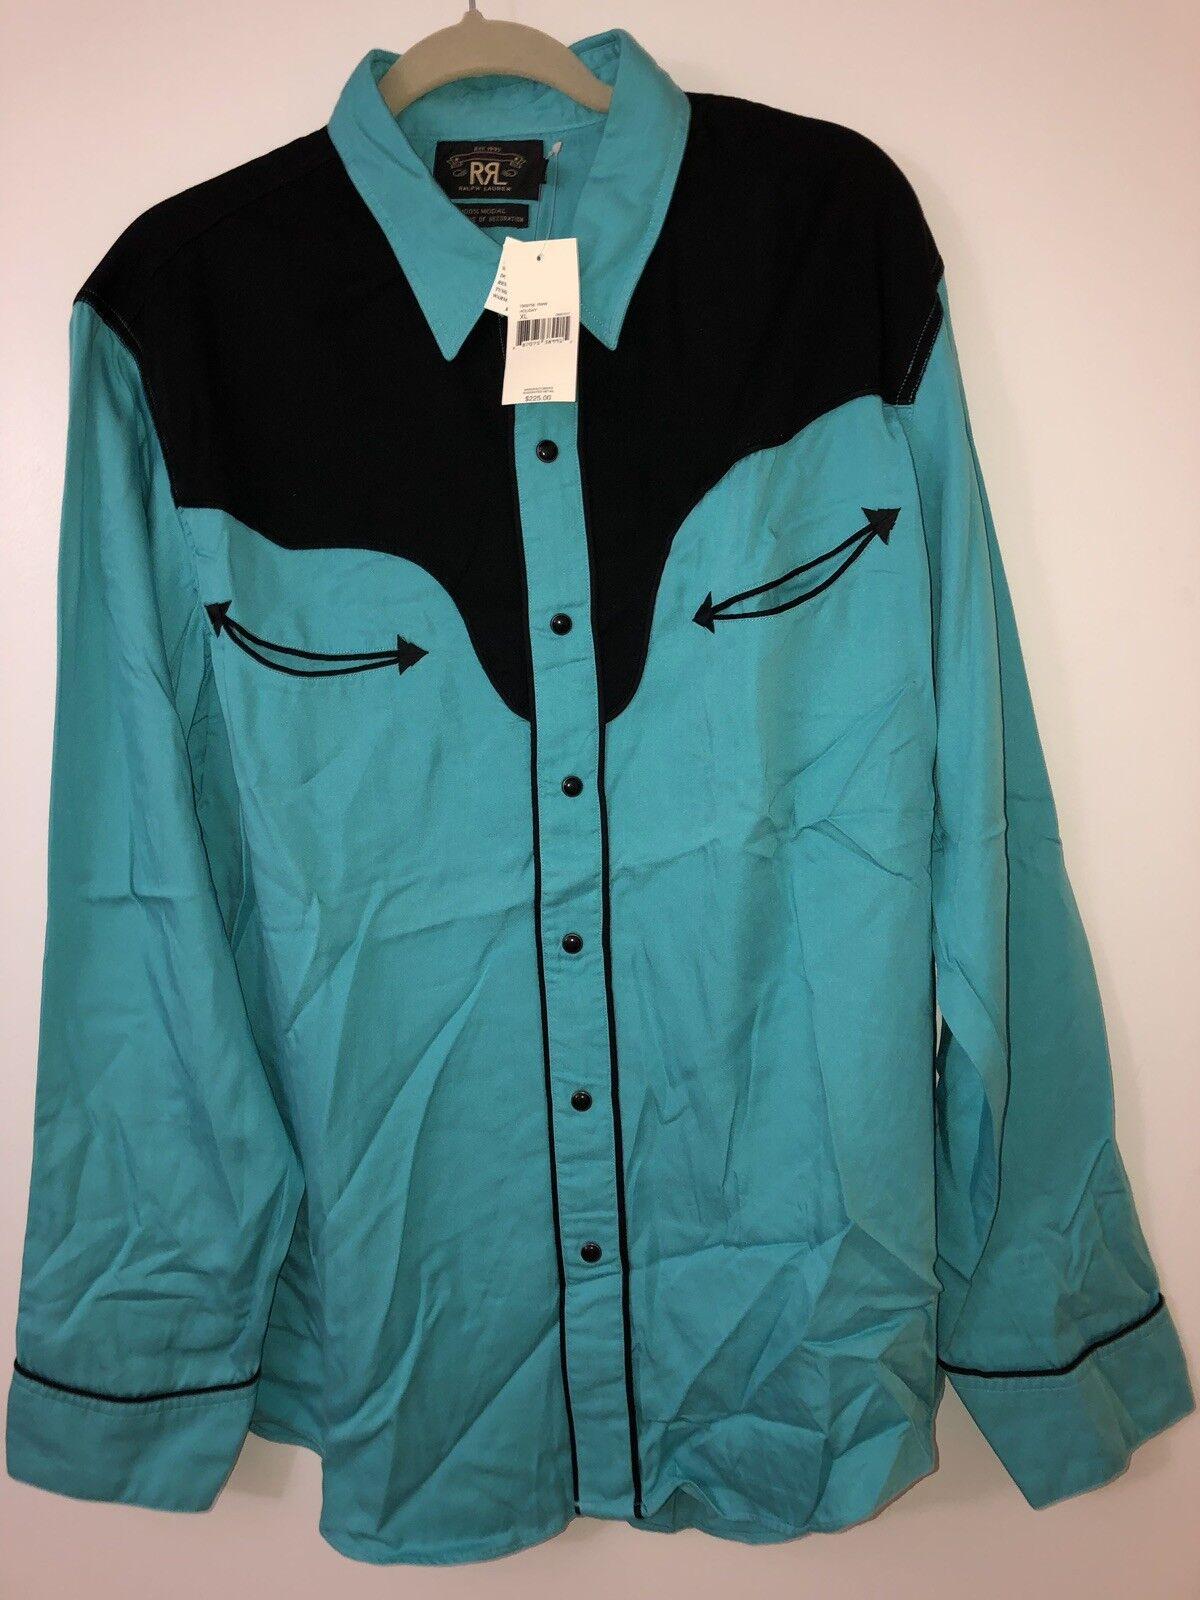 509b2aad RRL Ralph Lauren Double RL Vintage Western Cowboy Snap Button Down Shirt S